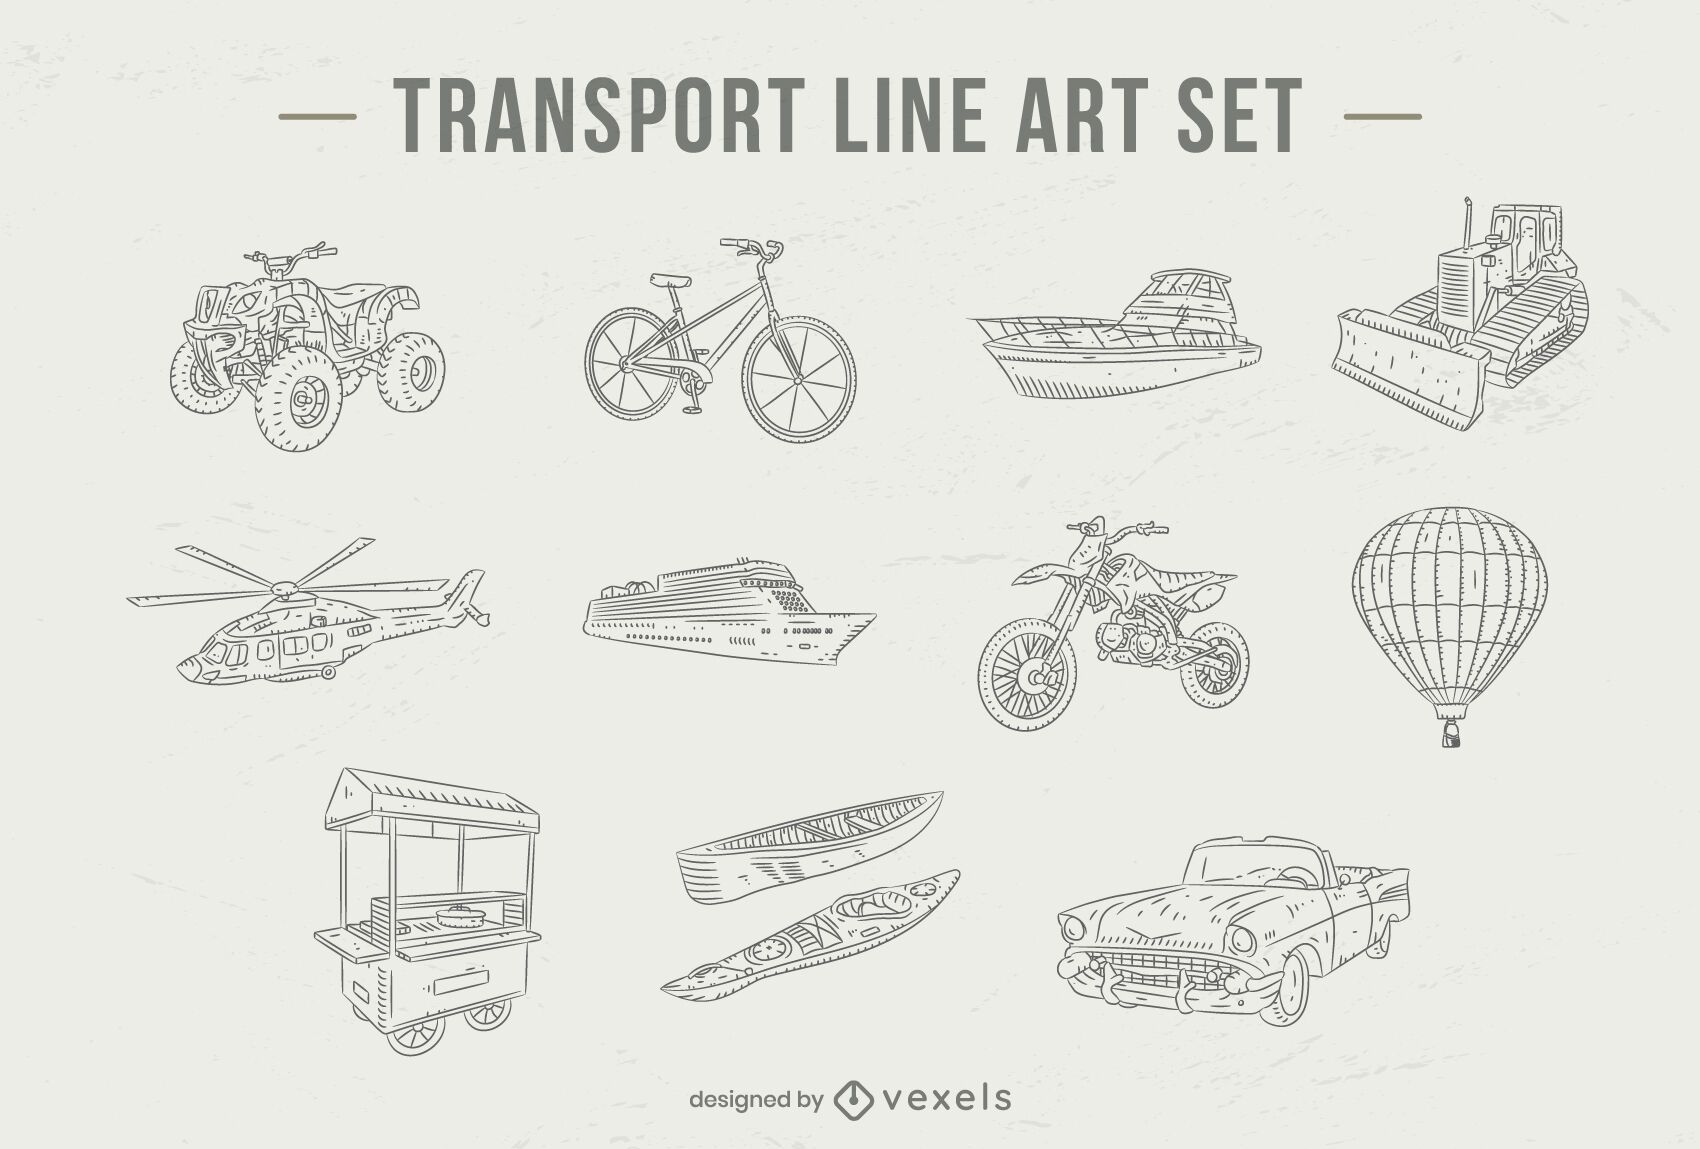 Transportation line art set